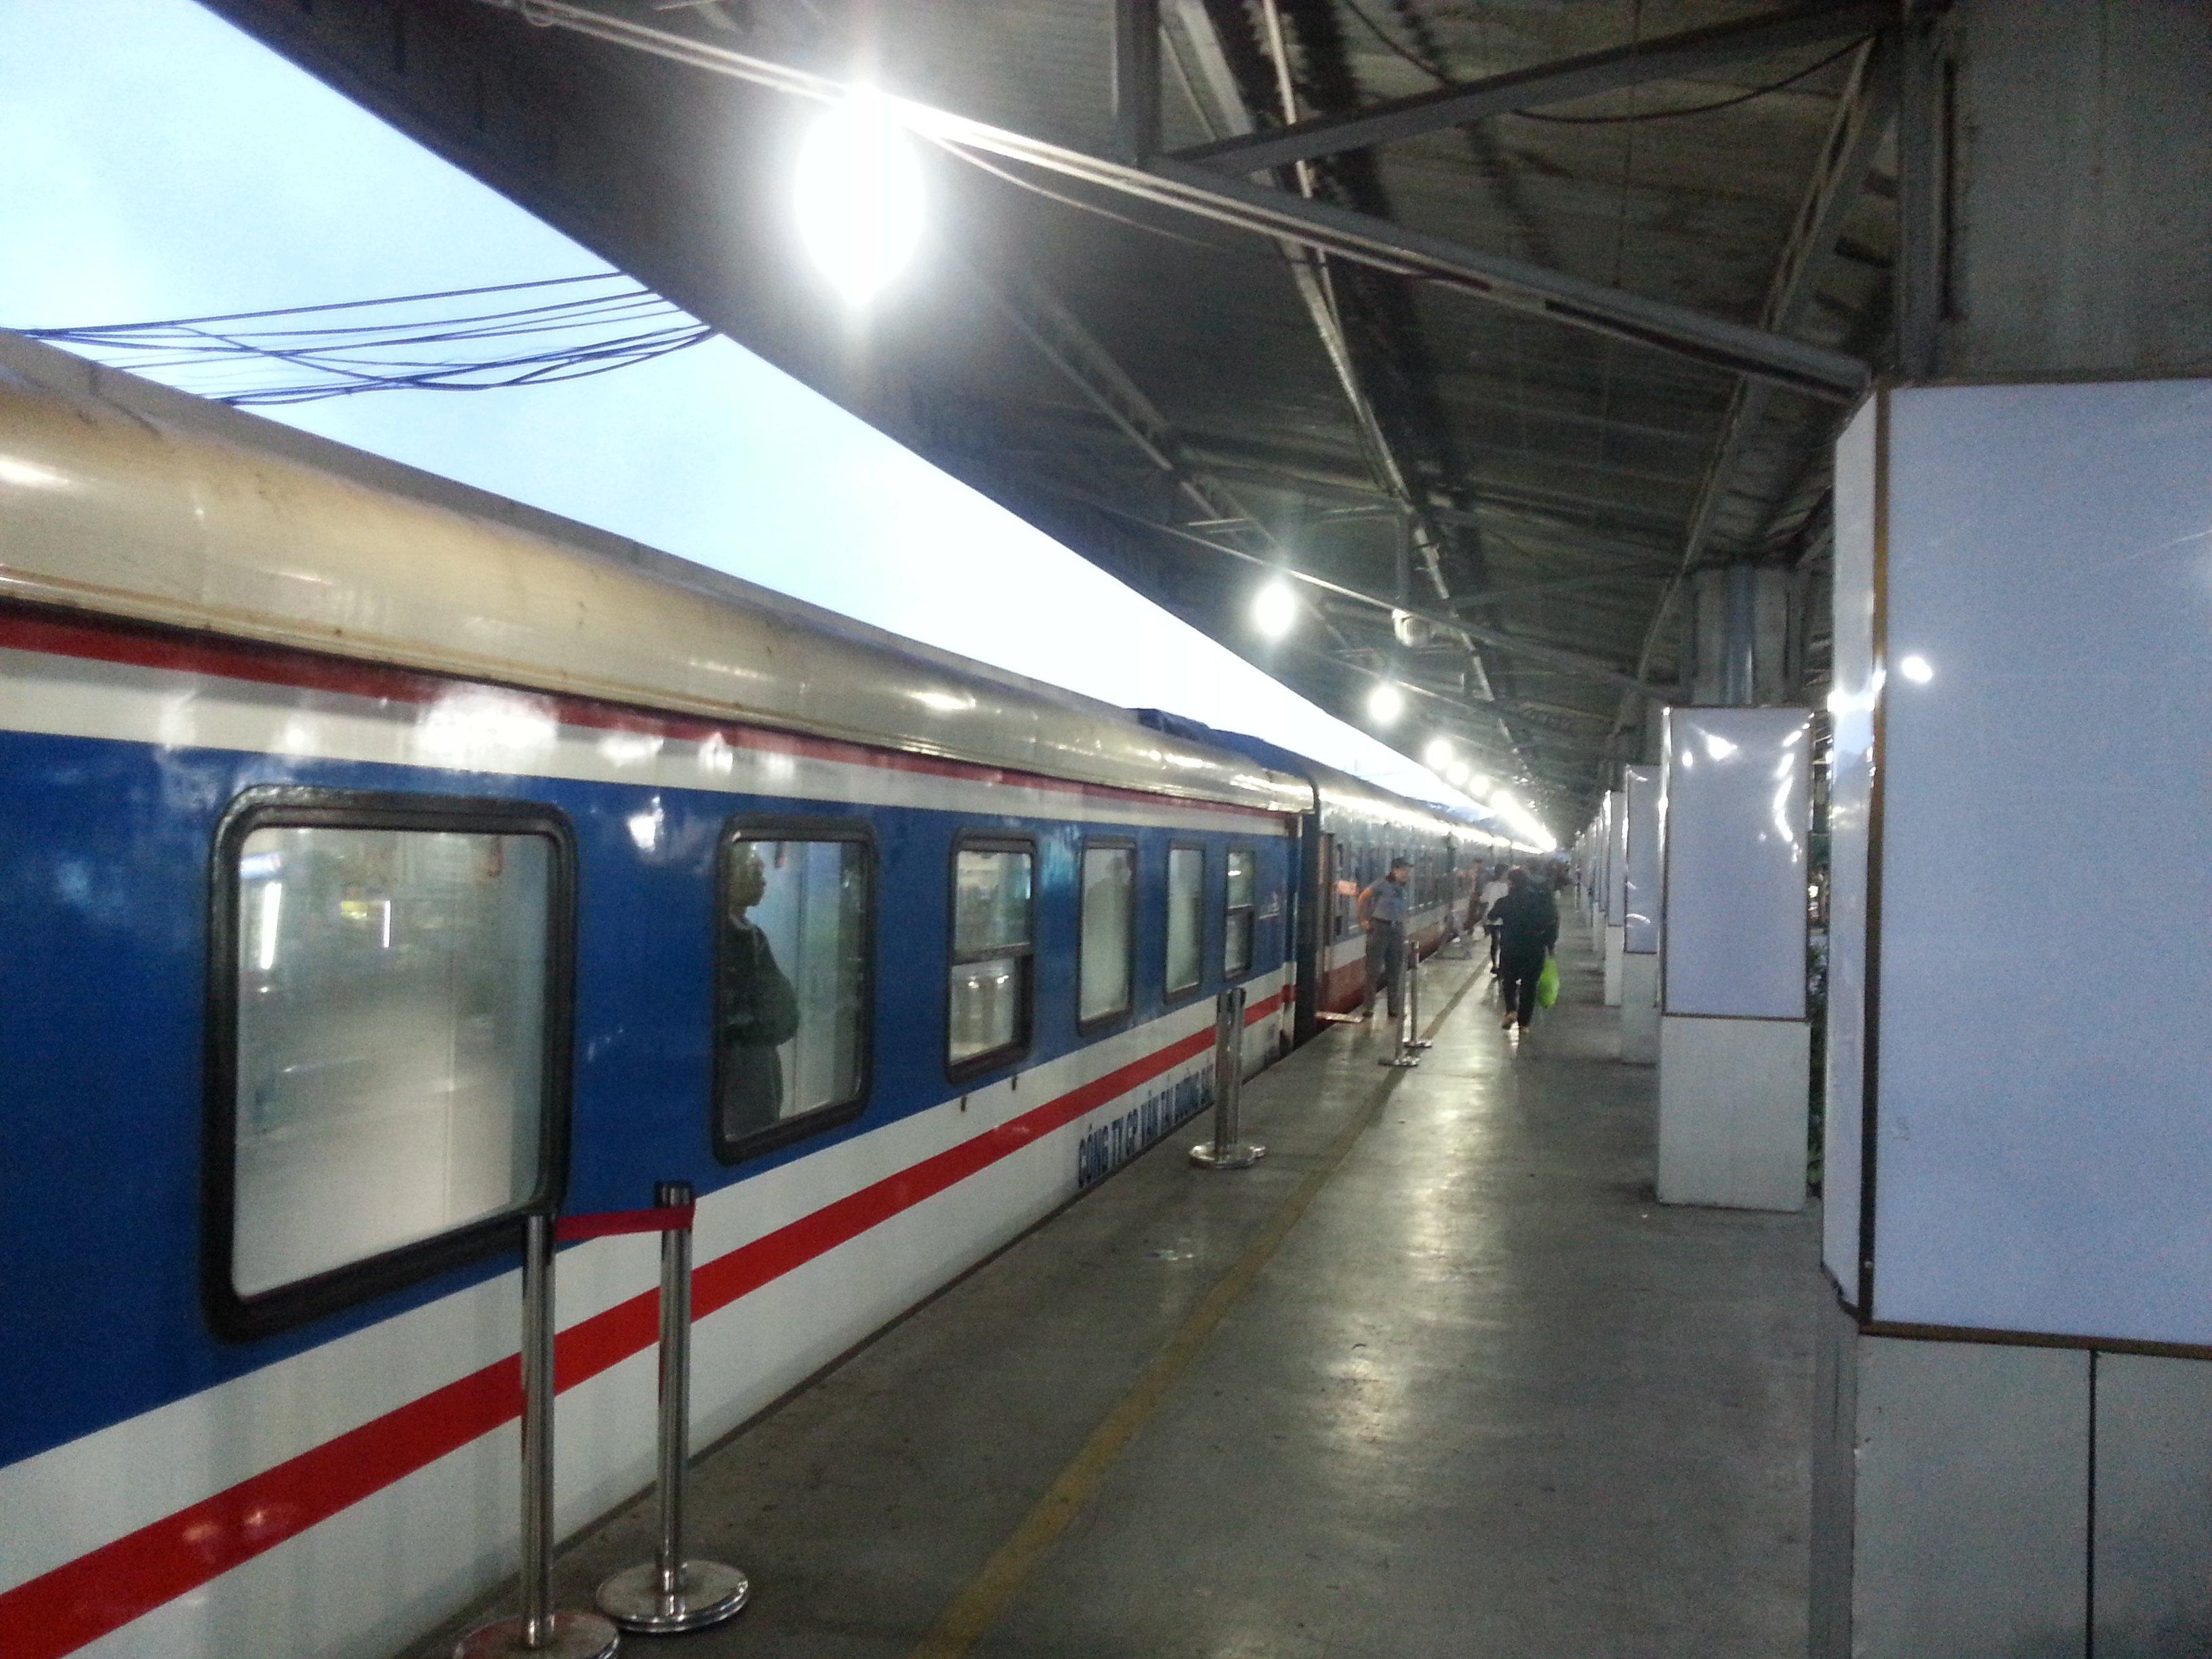 Vietnam train getting ready to depart